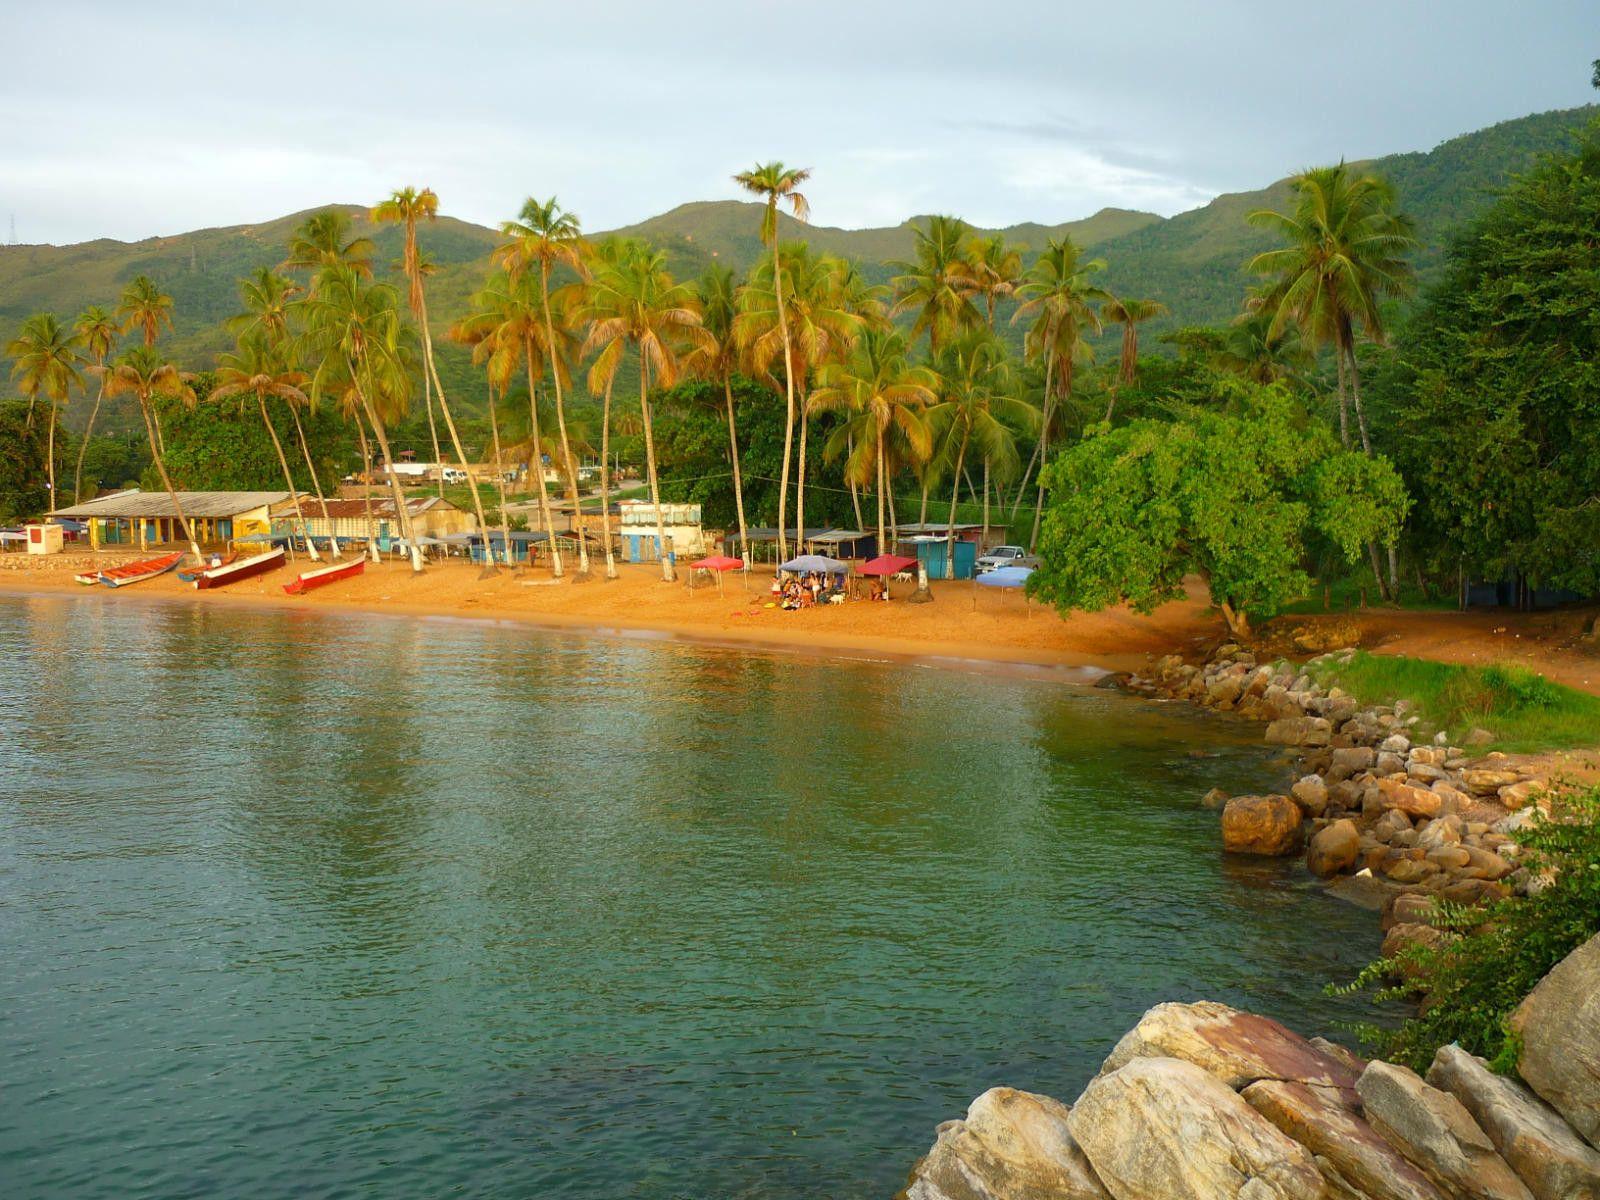 playa piscina puerto la cruz venezuela